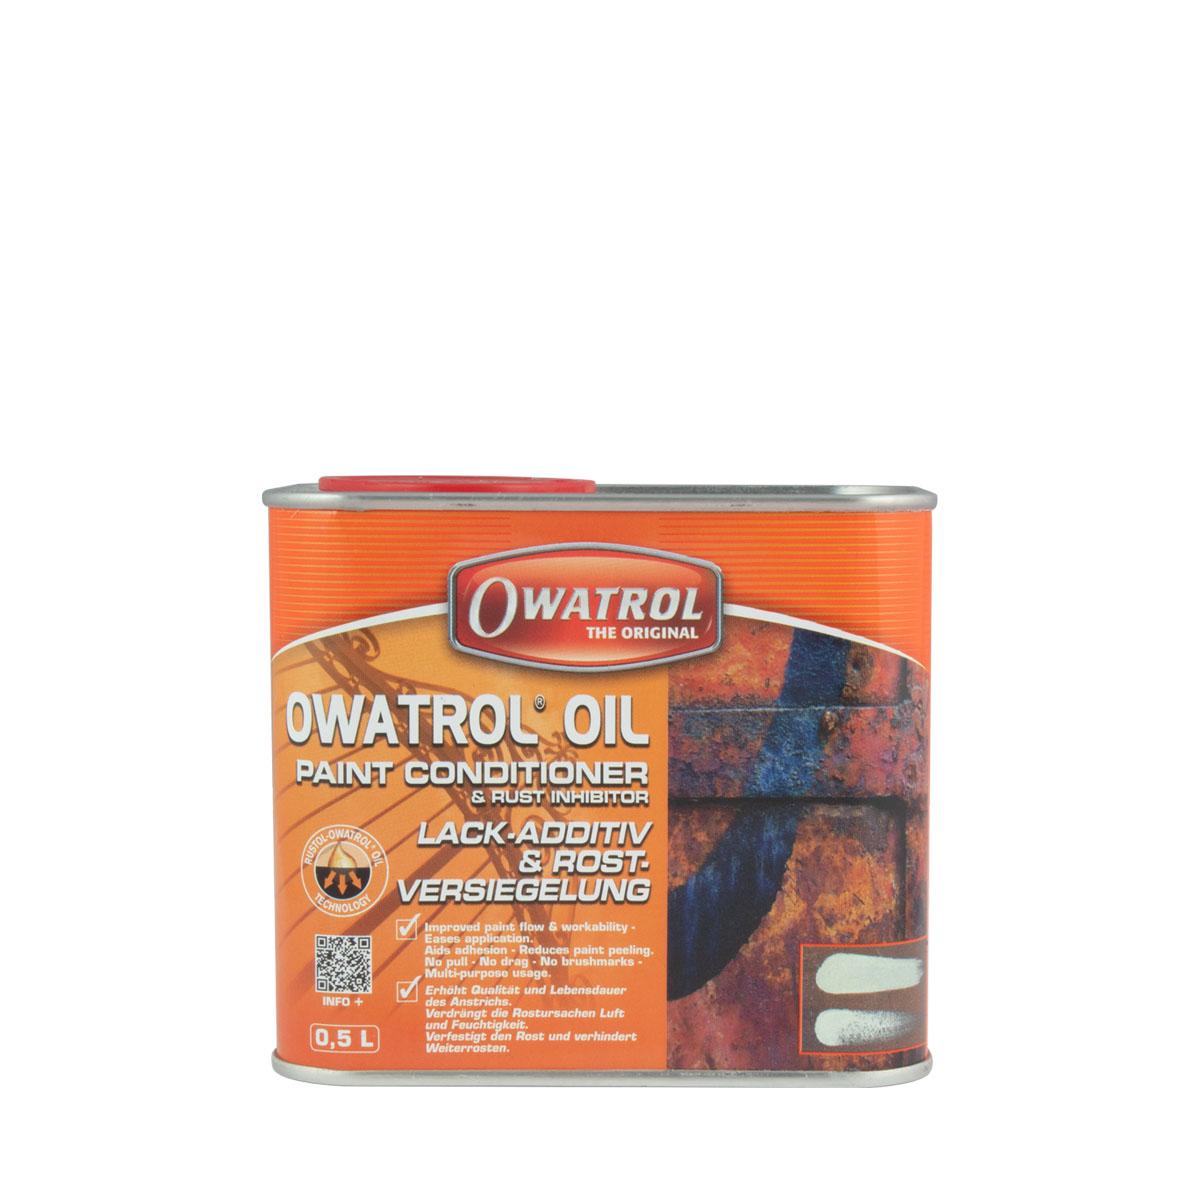 Owatrol Öl 500ml Dose, Kriechöl, Rostkonservierer, Lackadditiv